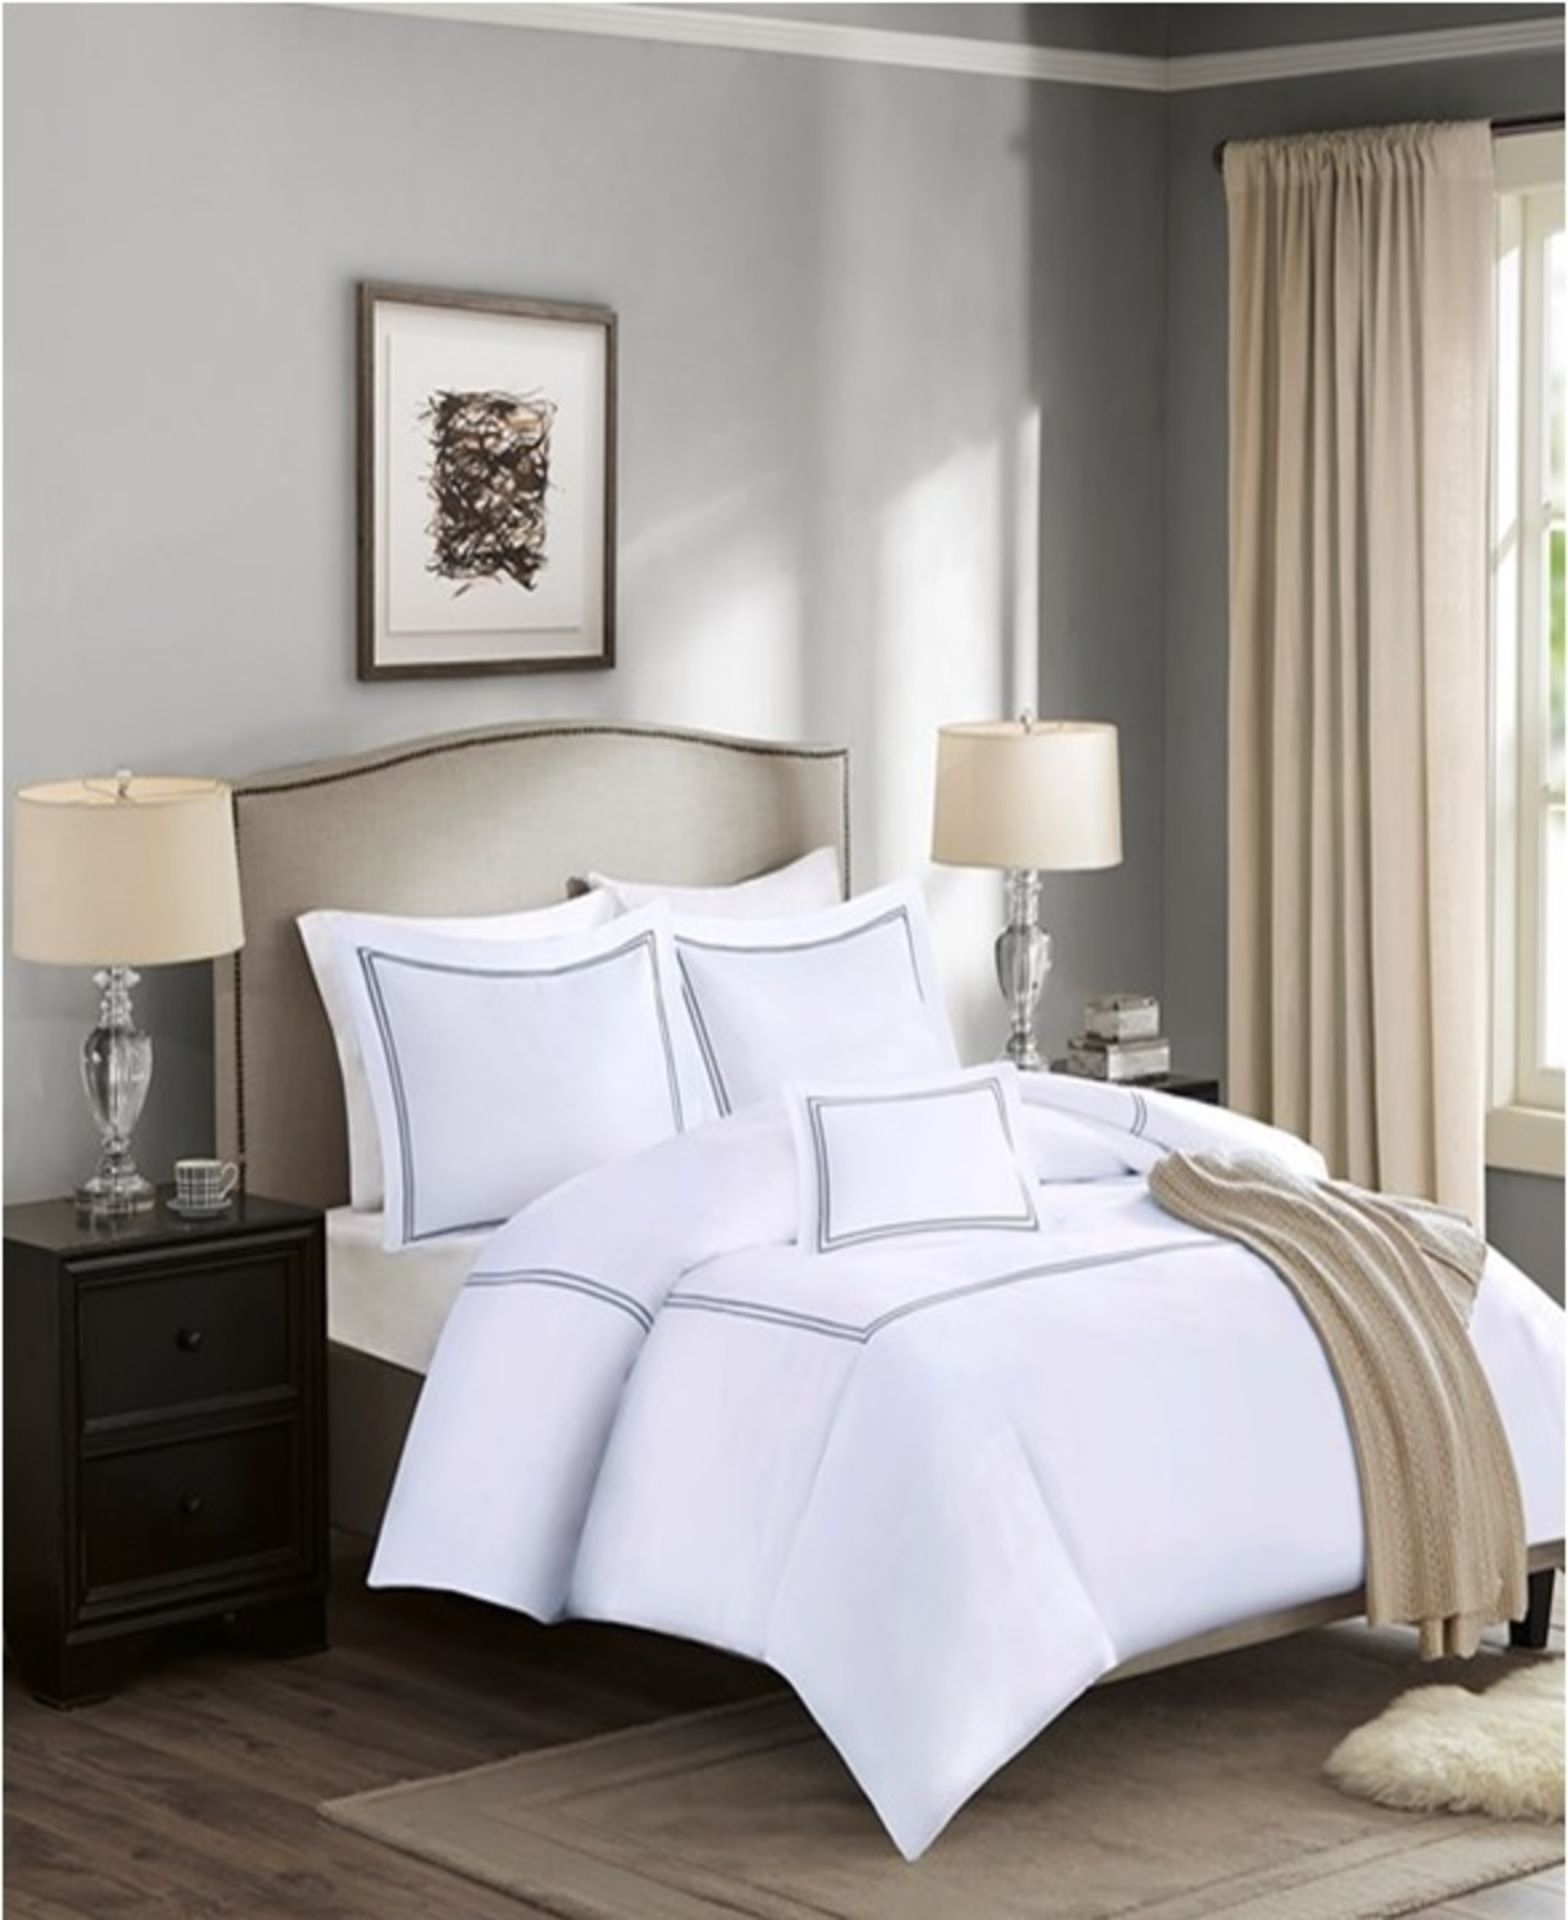 Lot 152 - 1 x Madison Park Luxury Collection Double Duvet Set White - Product Code MP12-0198UK (Brand New -